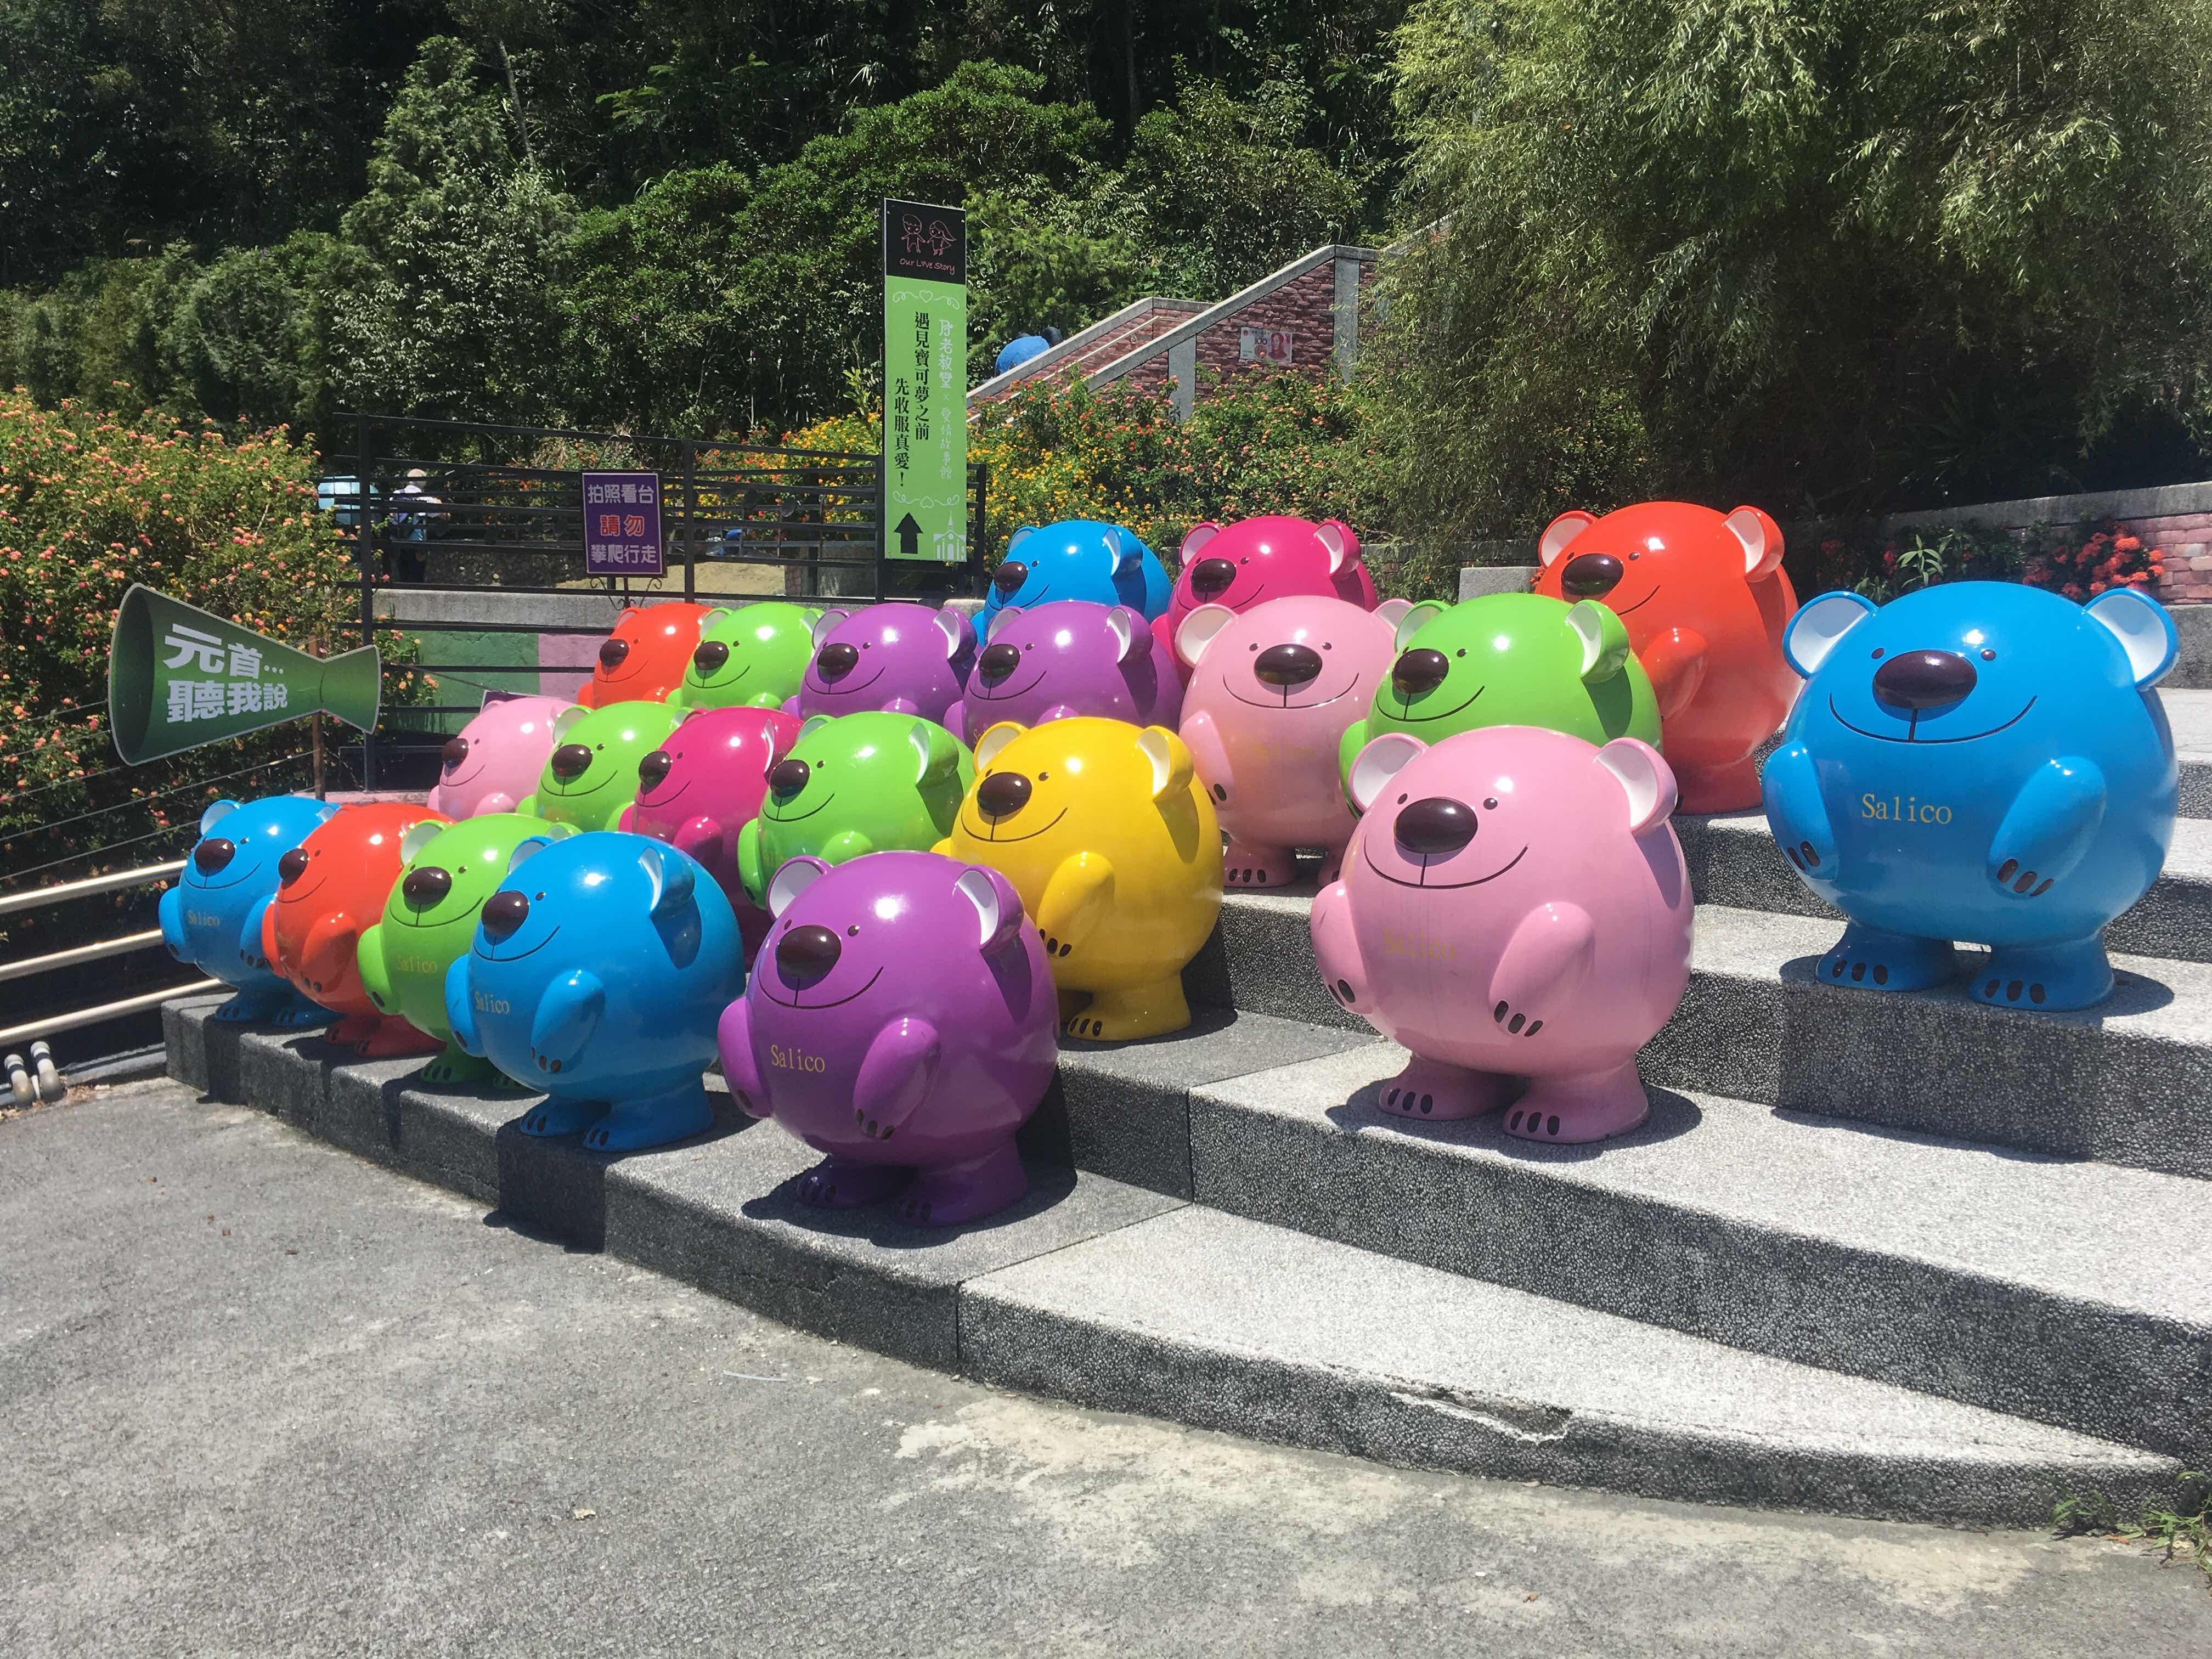 king's garden themed bakery nantou Taiwan